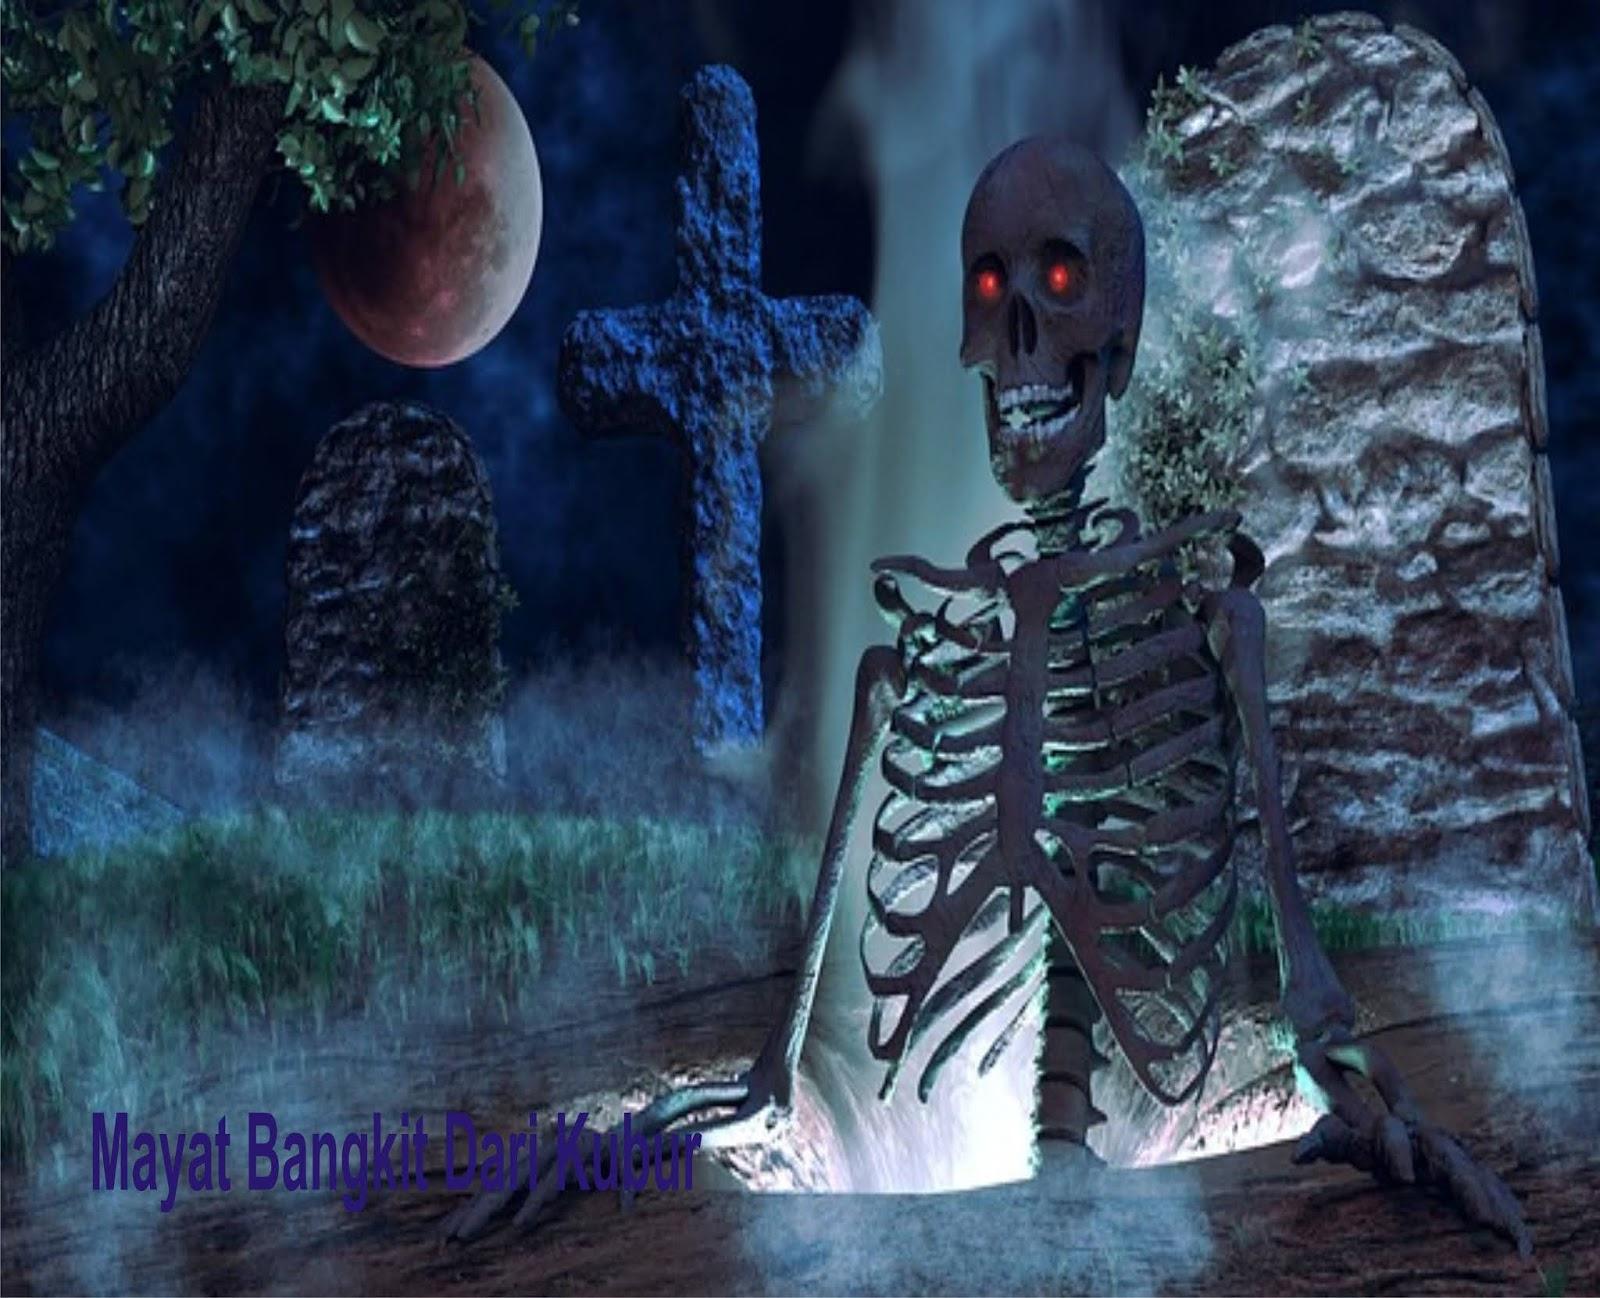 Mayat bangkit dari kubur